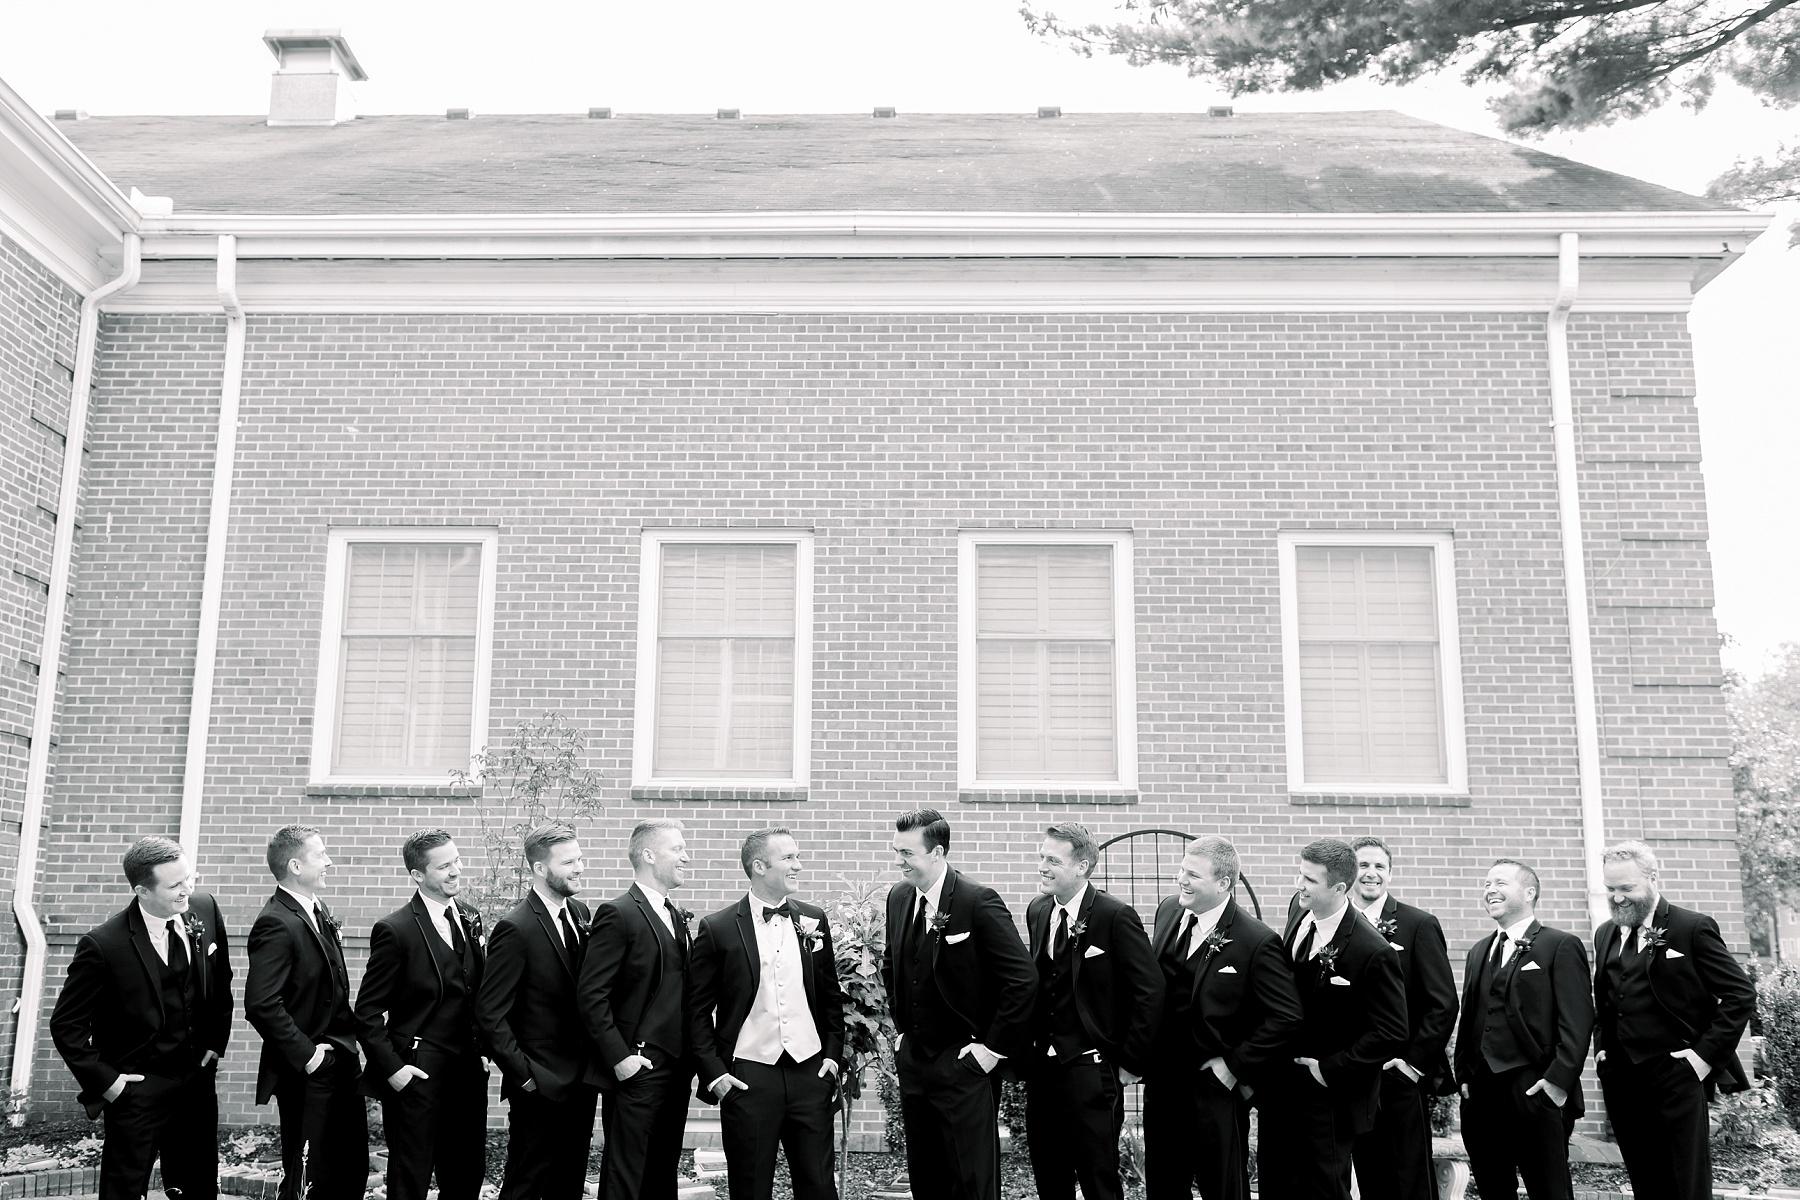 midwest-adventurous-wedding-photographer-elizabeth-ladean-photography-photo_4837.jpg